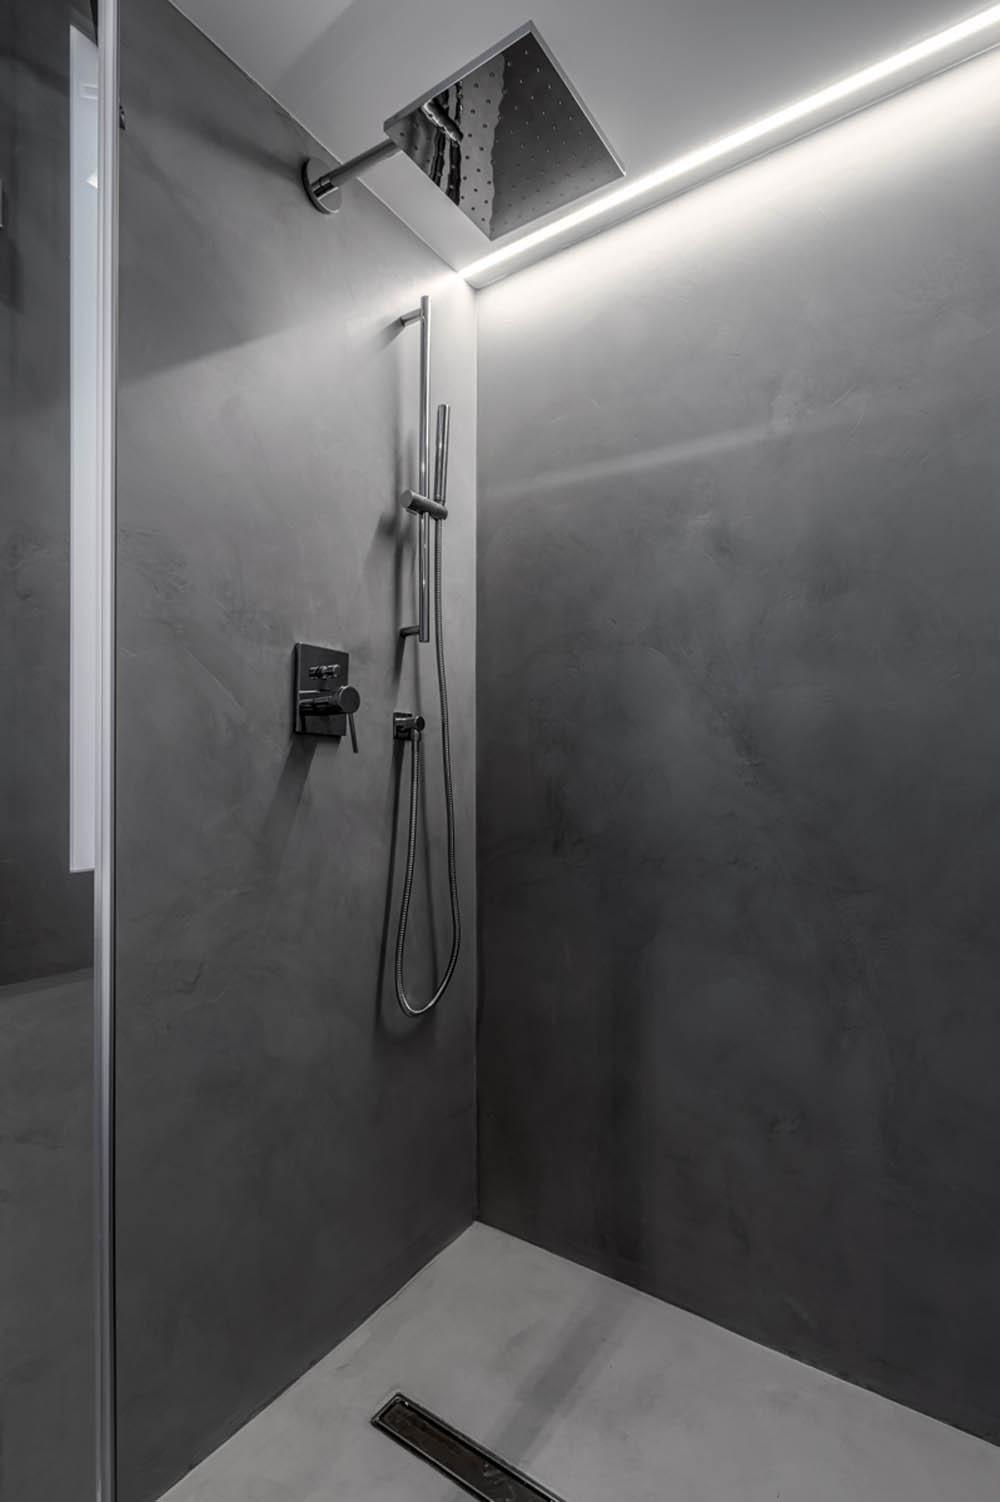 Tico en alicante sombras iluminacion for Led para ducha